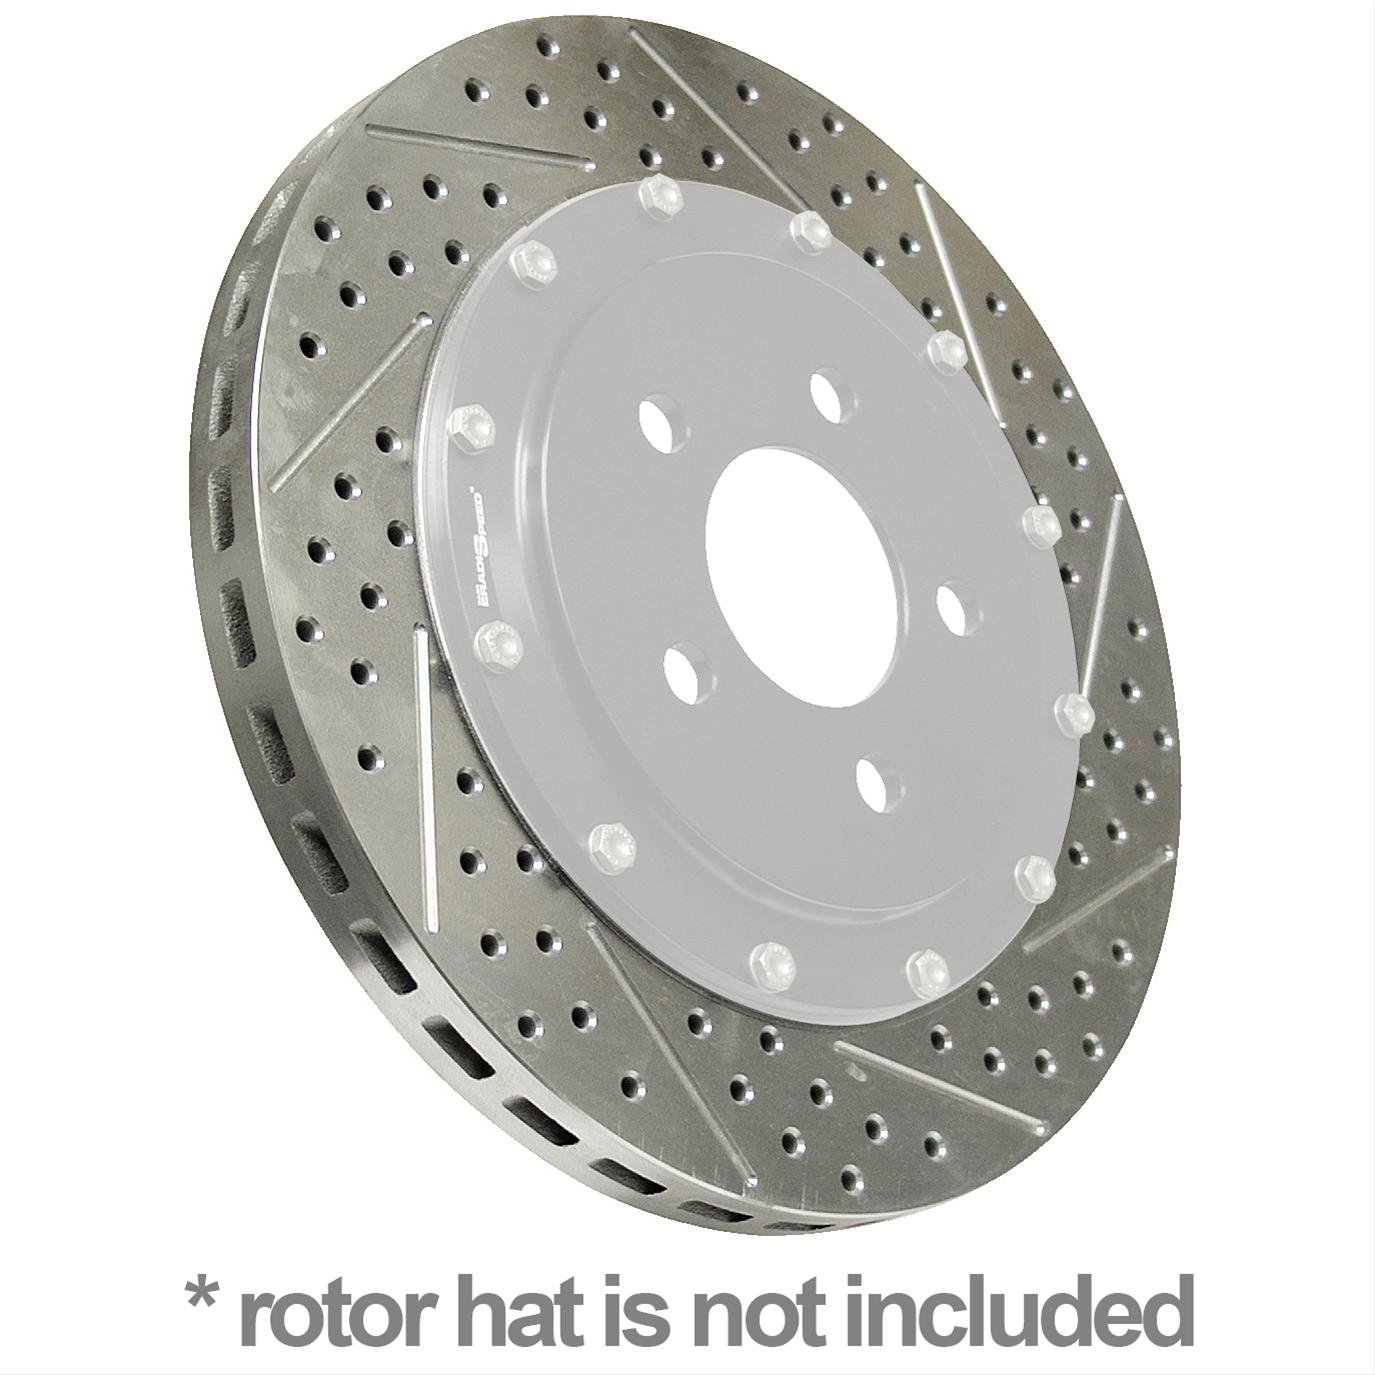 Brake rotor replacement coupons